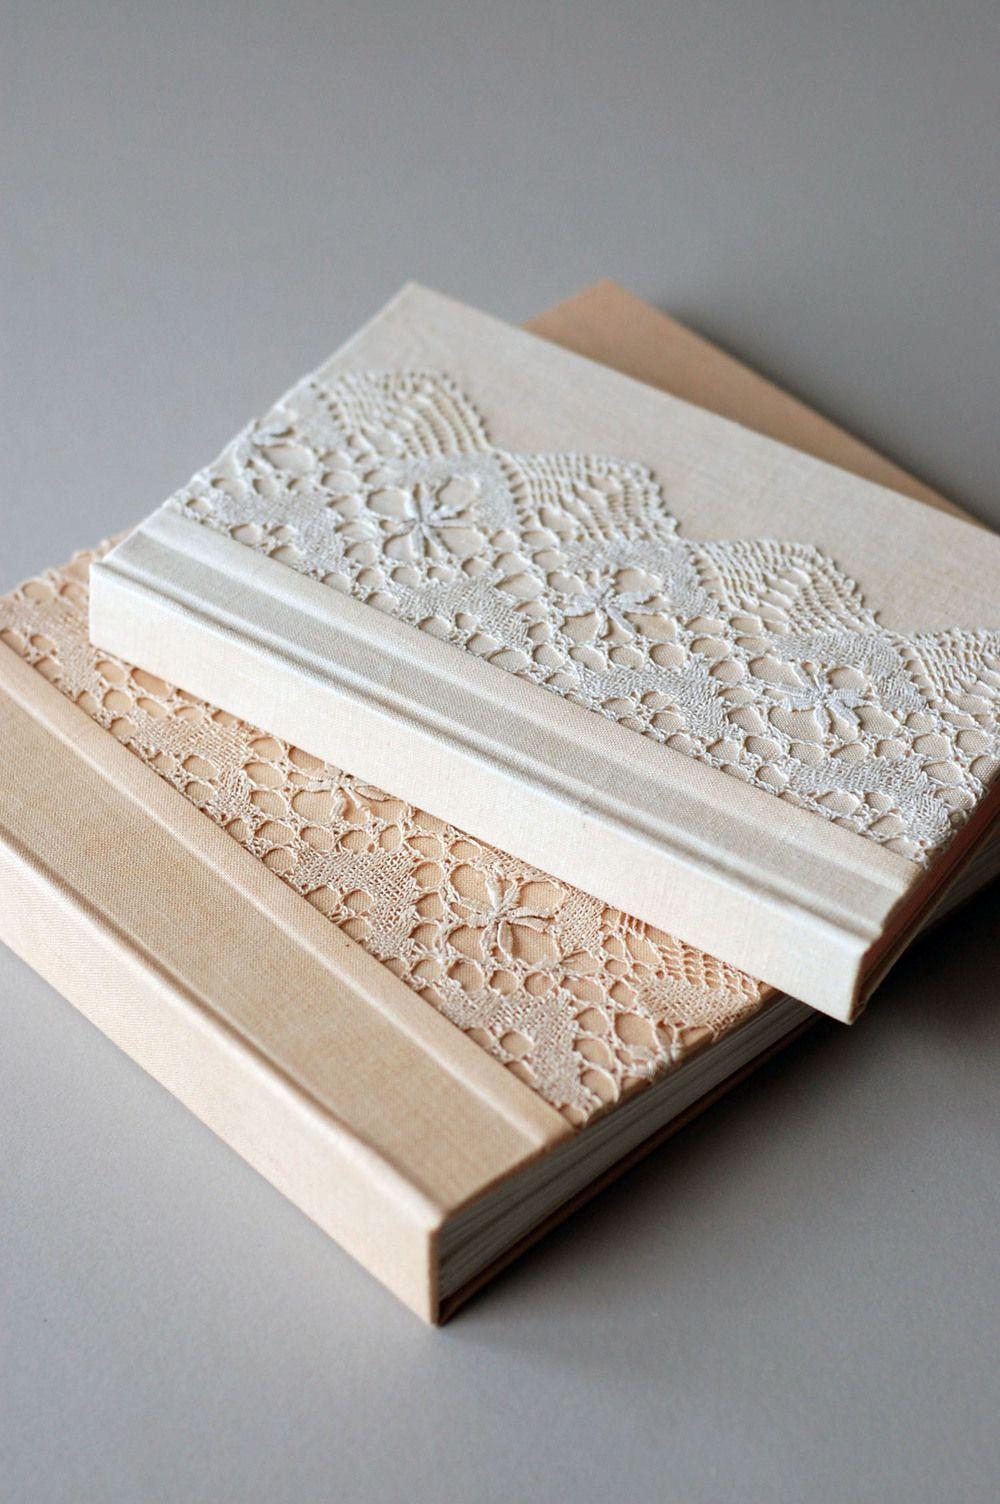 bookbinding by natalie stopka handmade books journals pinterest buch binden b cher und. Black Bedroom Furniture Sets. Home Design Ideas